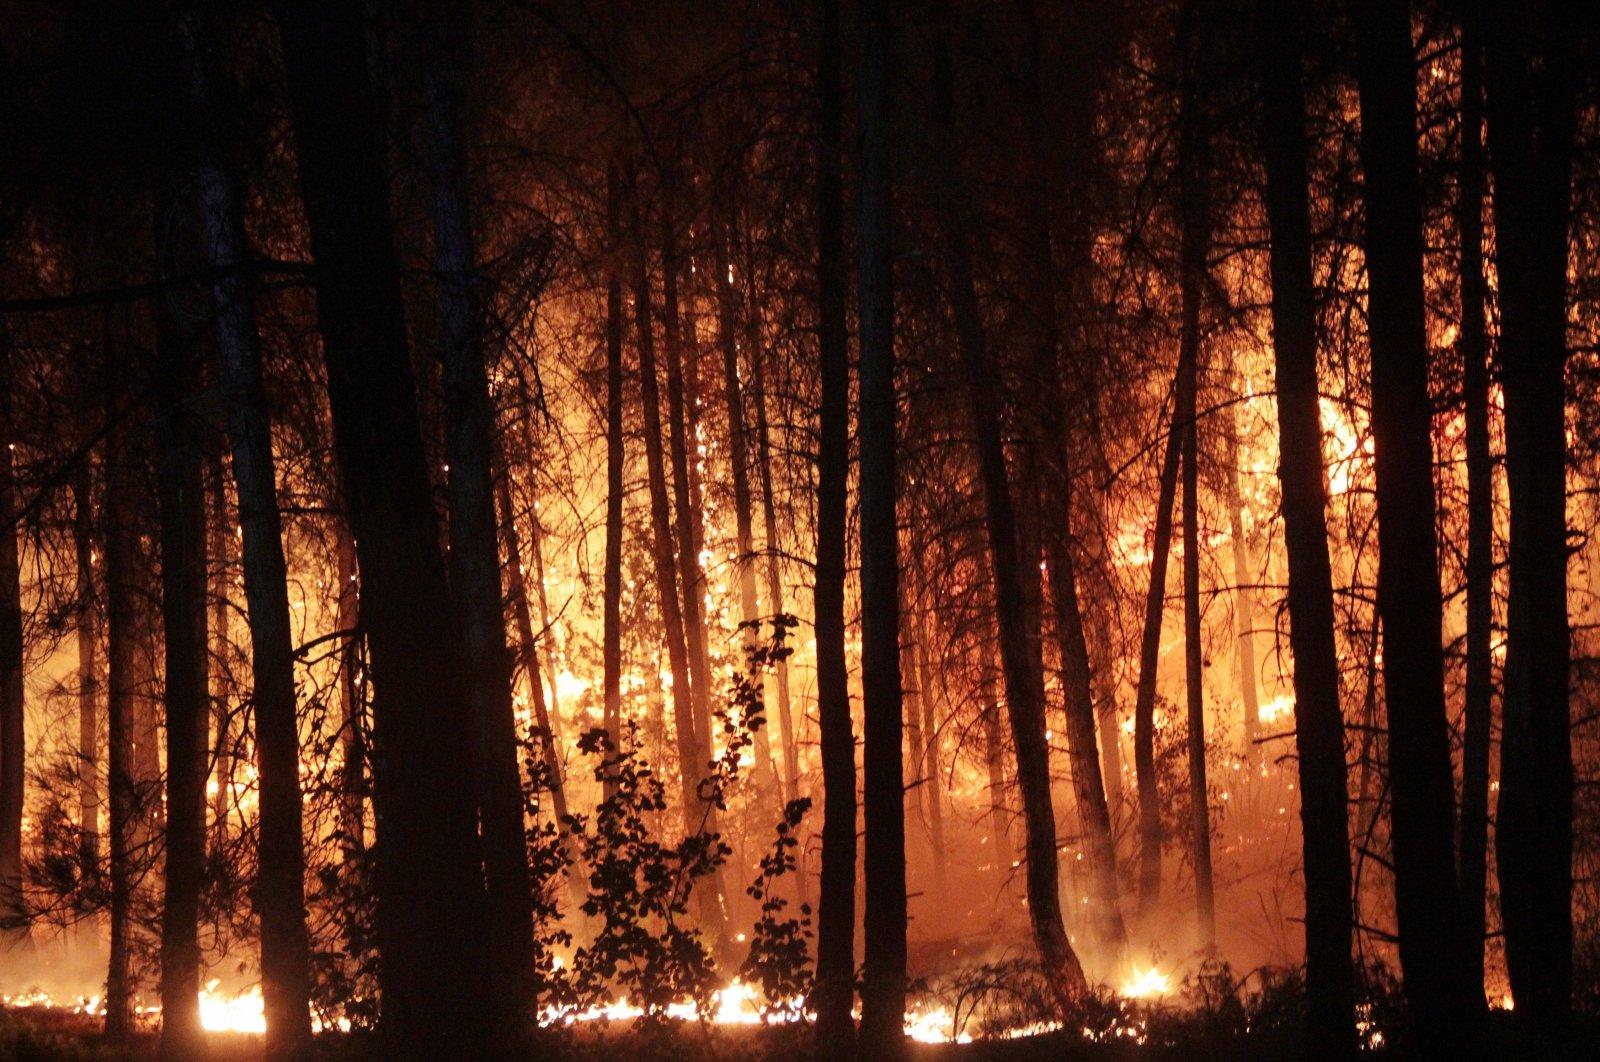 Flames engulf trees in the Muratlar neighborhood of Menteşe district, in Muğla, southwestern Turkey, Aug. 4, 2021. (İHA PHOTO)